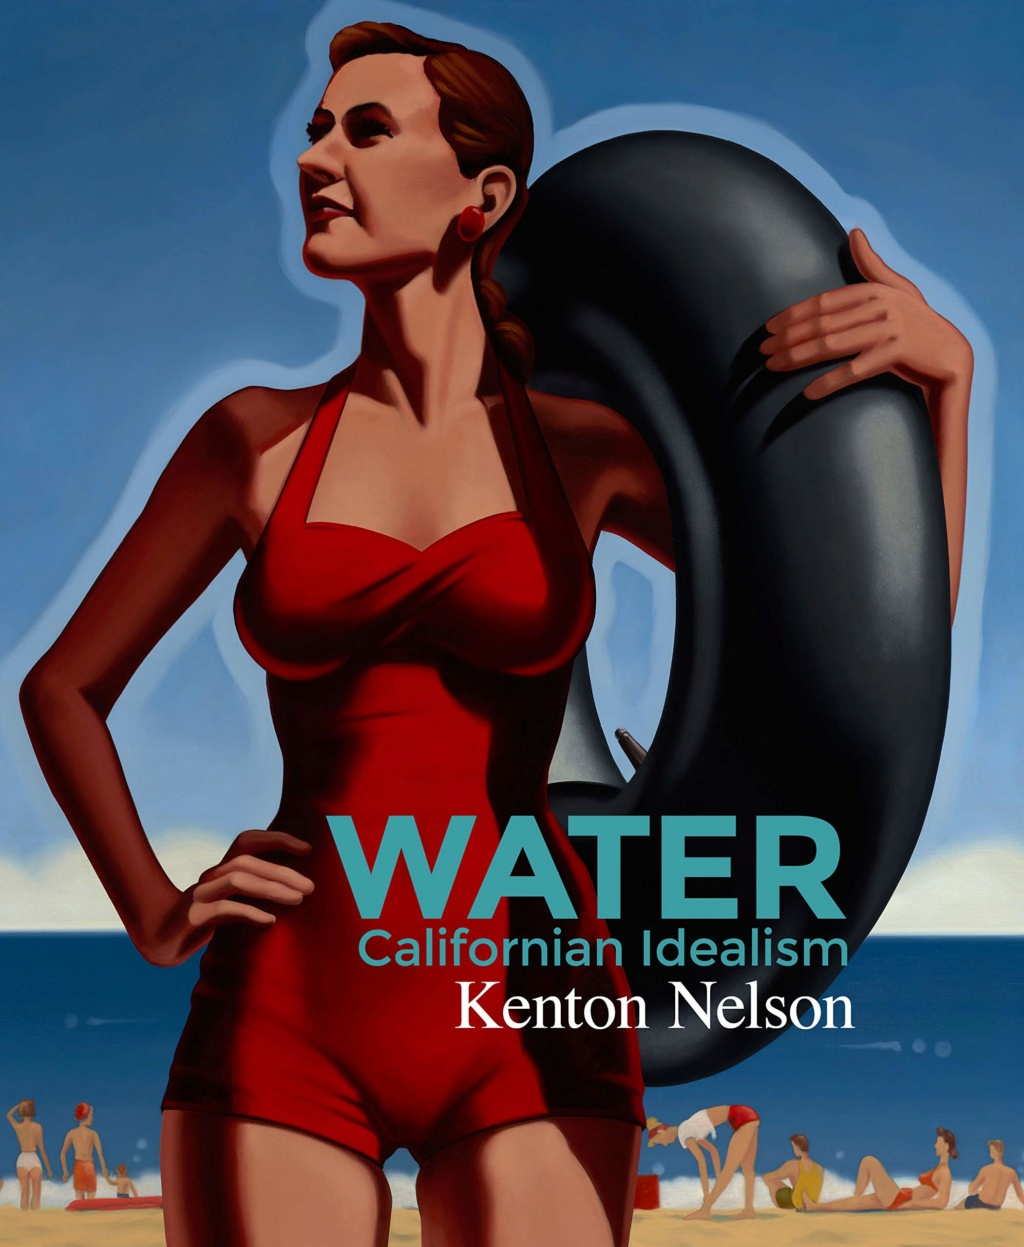 Kenton Nelson  A975